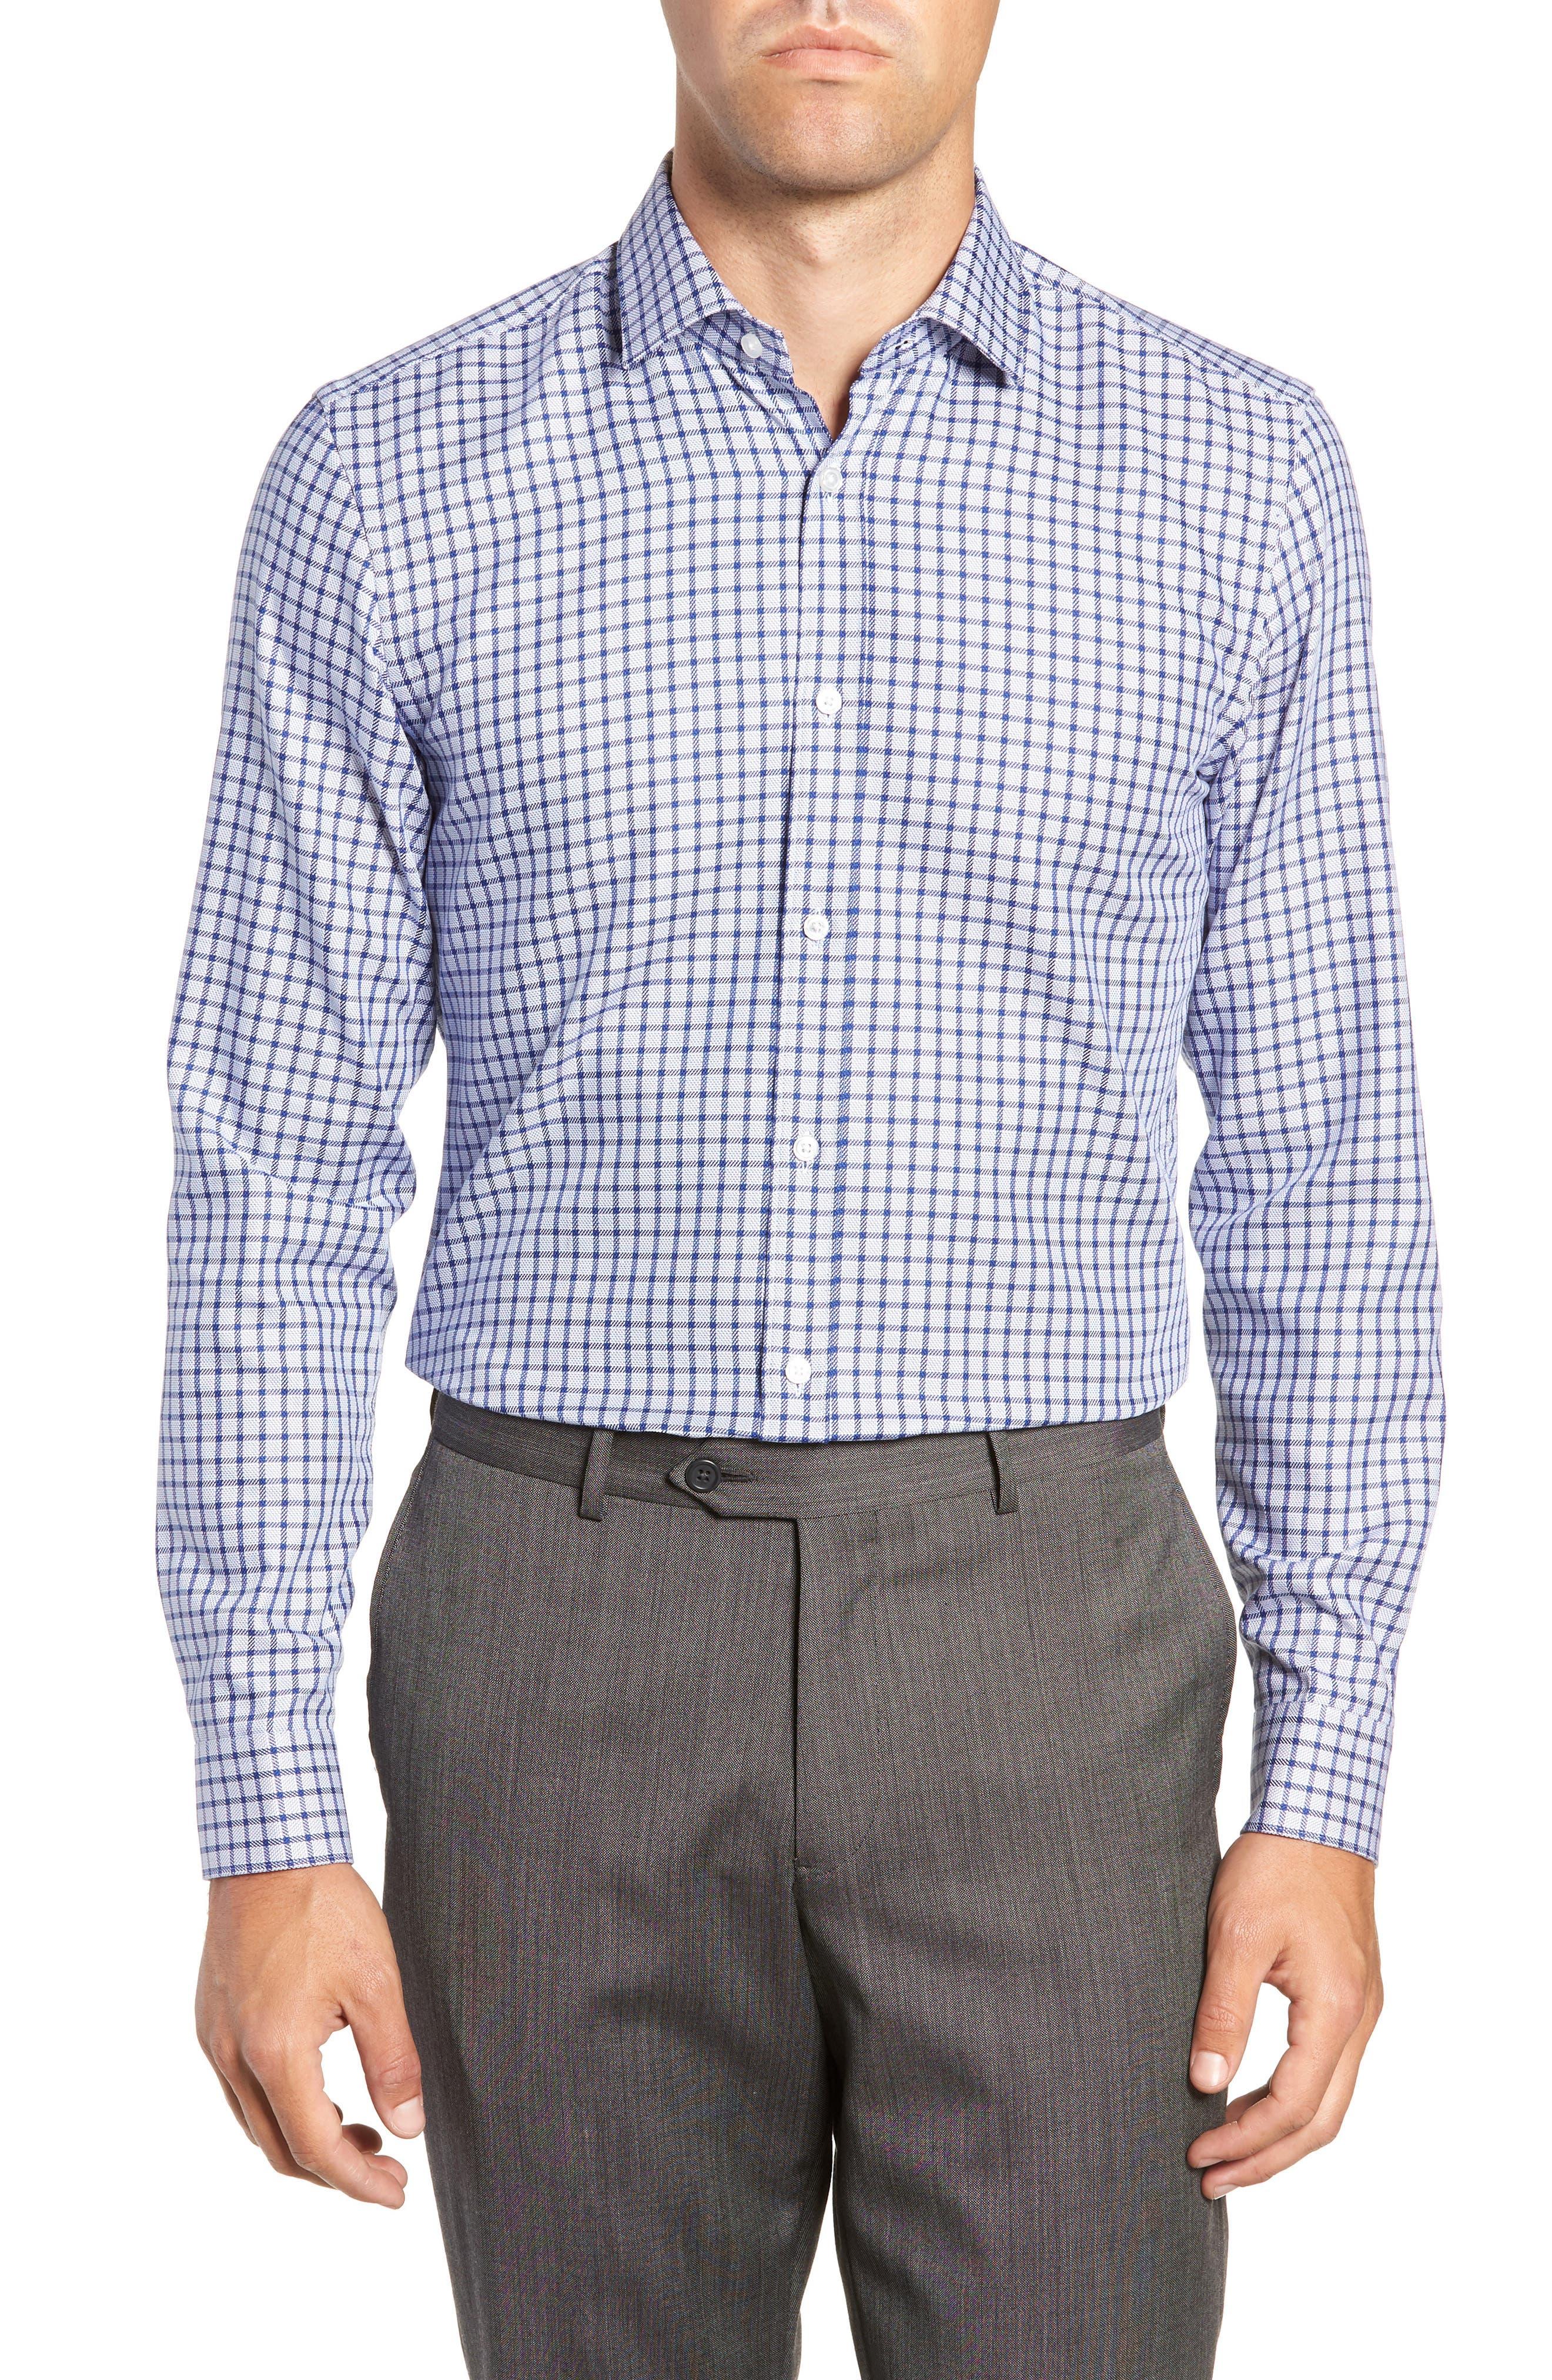 x Nordstrom Isaac Slim Fit Check Dress Shirt,                         Main,                         color, BLUE